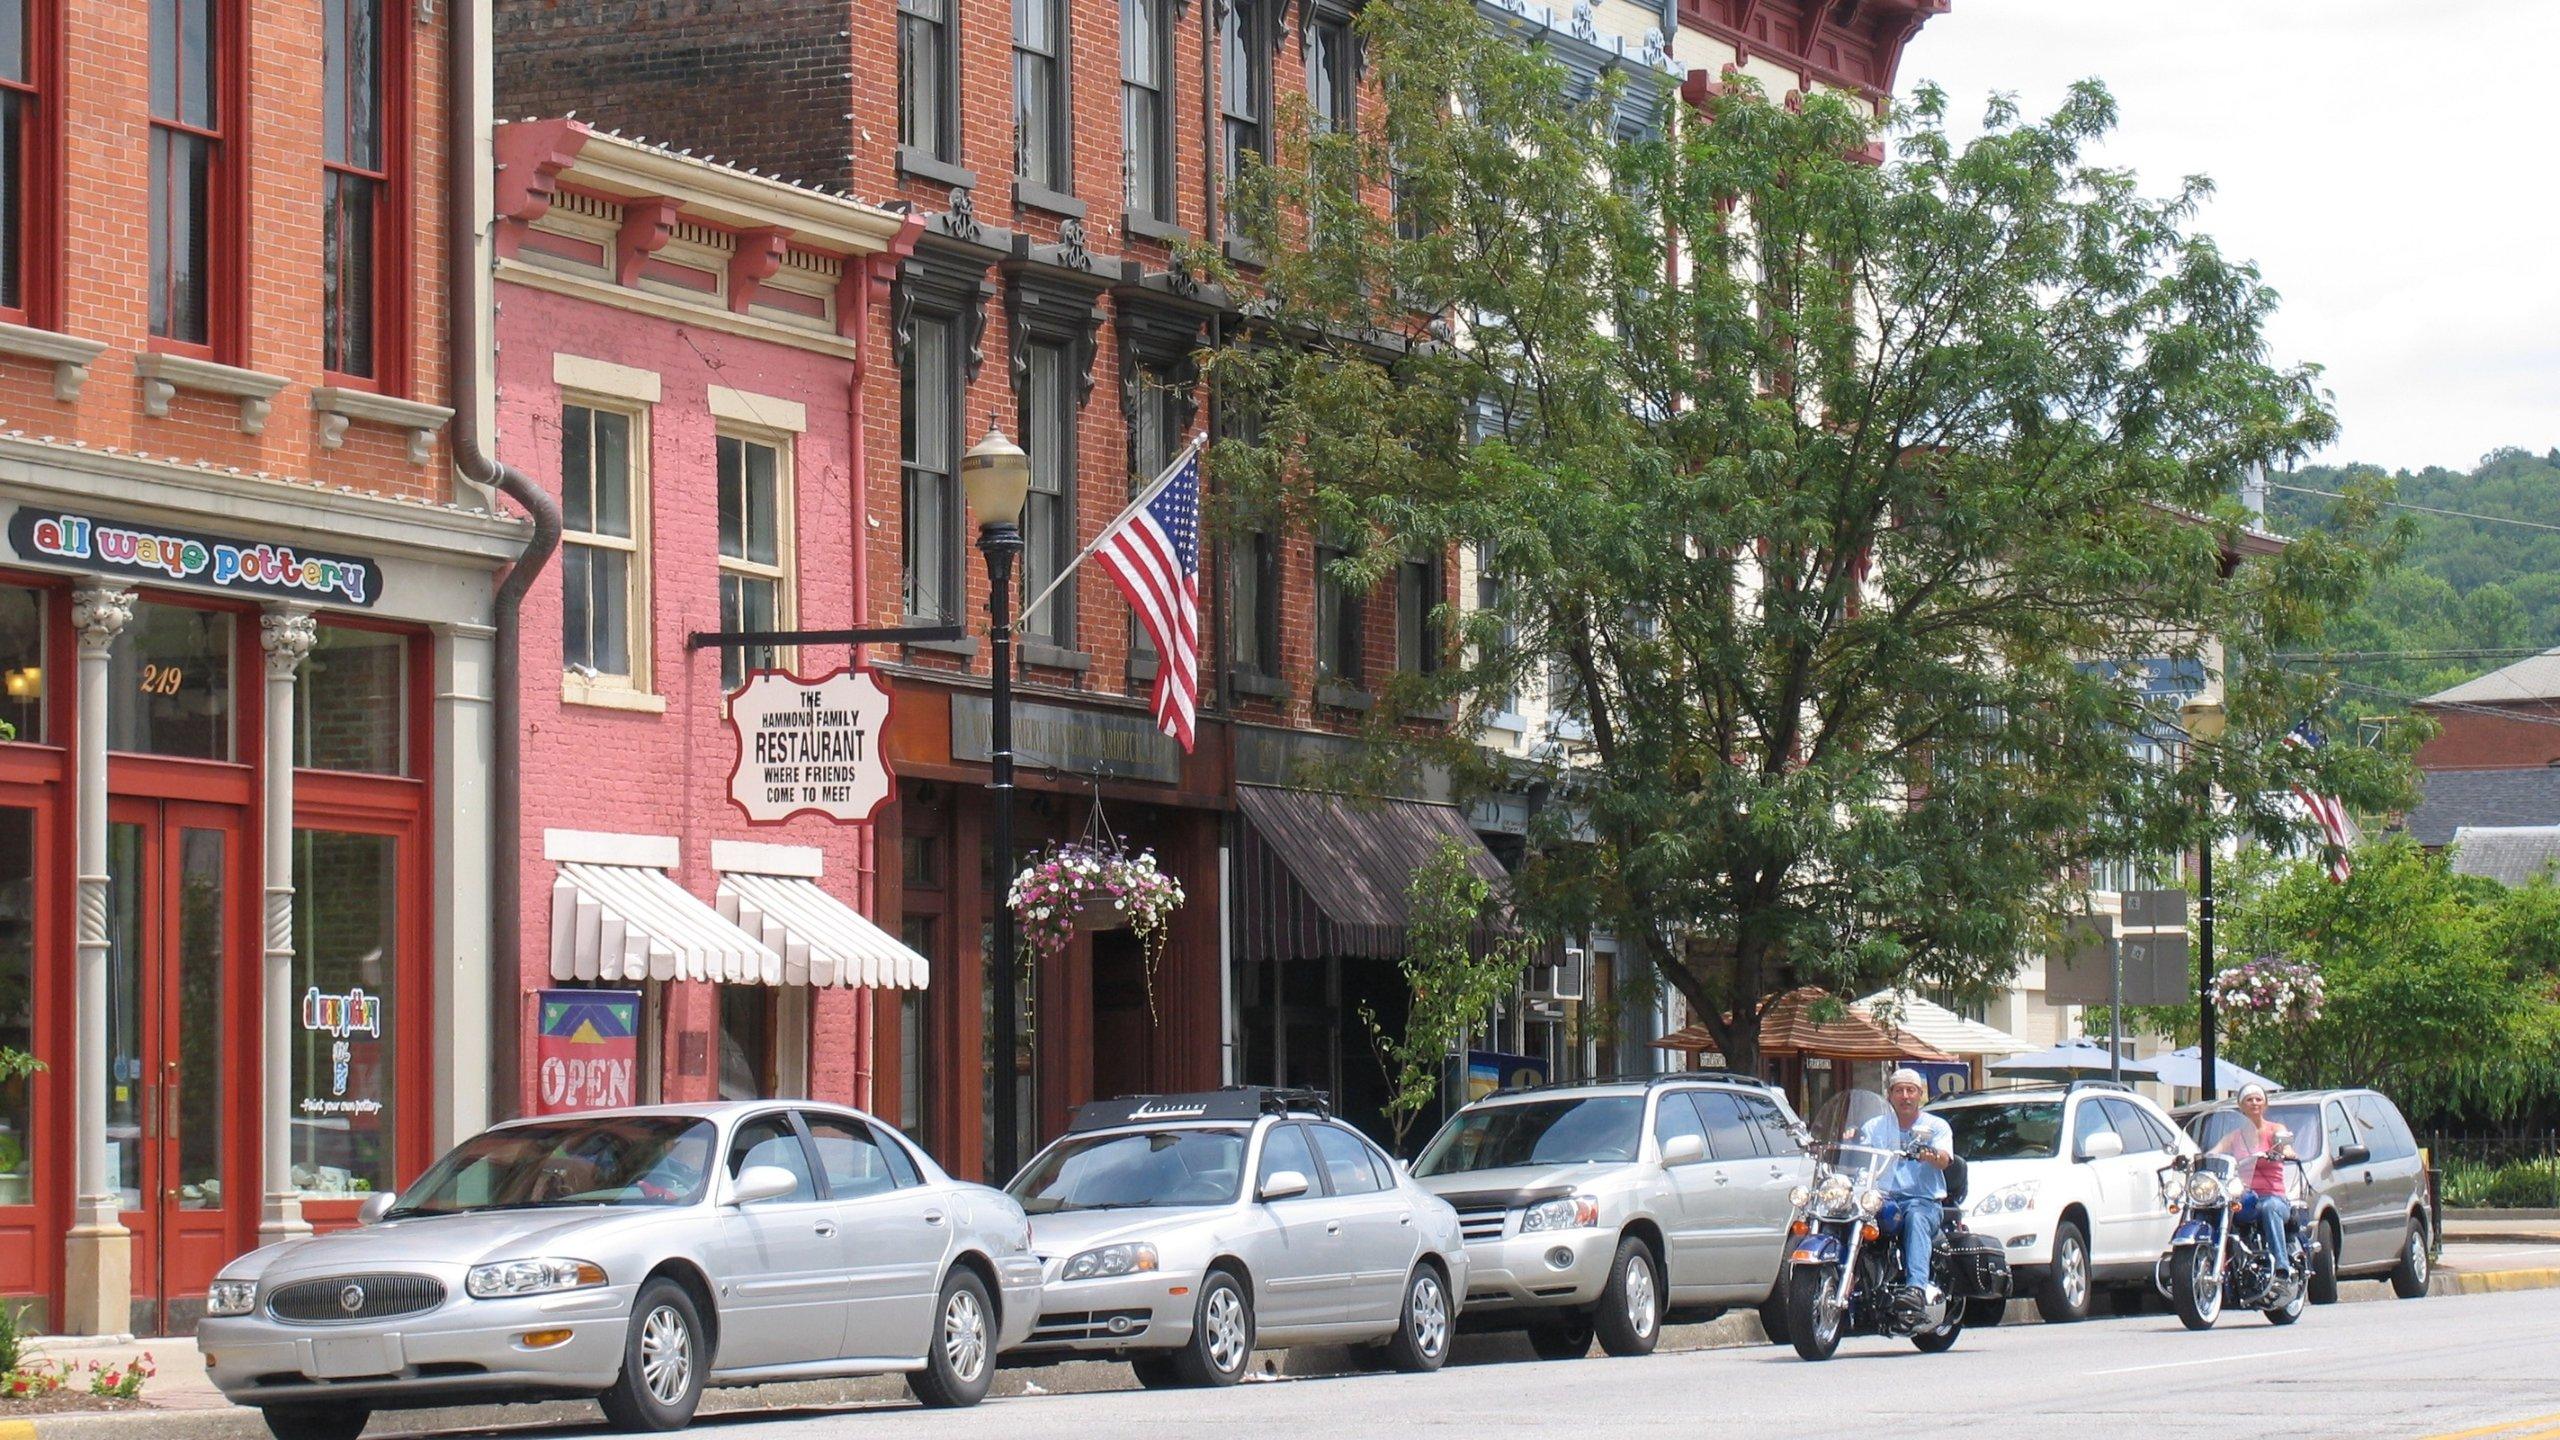 Americinn Hotels: Cheap Madison Americinn Hotel Deals | Expedia